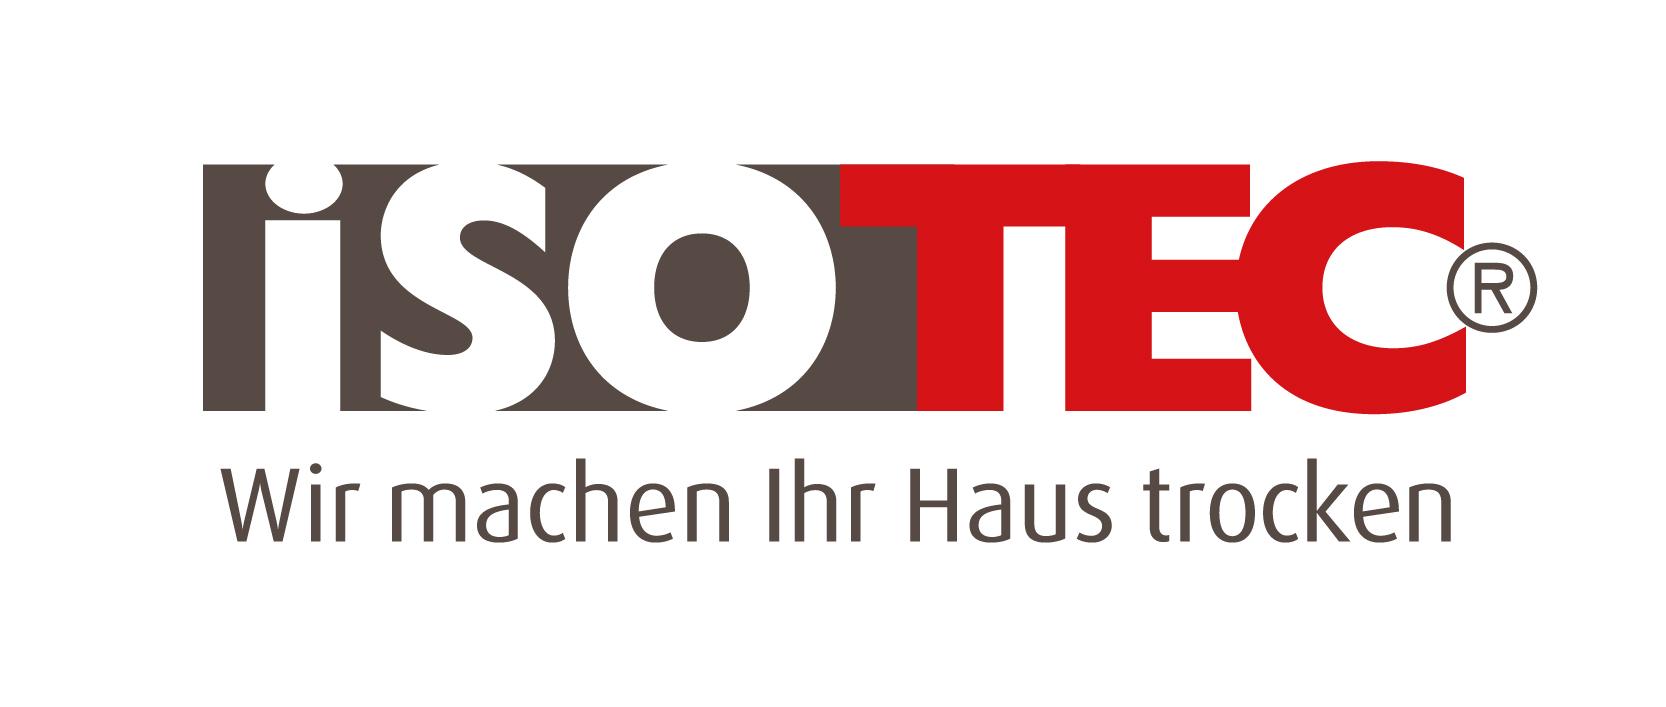 ISOTEC-Fachbetrieb Abdichtungssysteme Scheibli AG